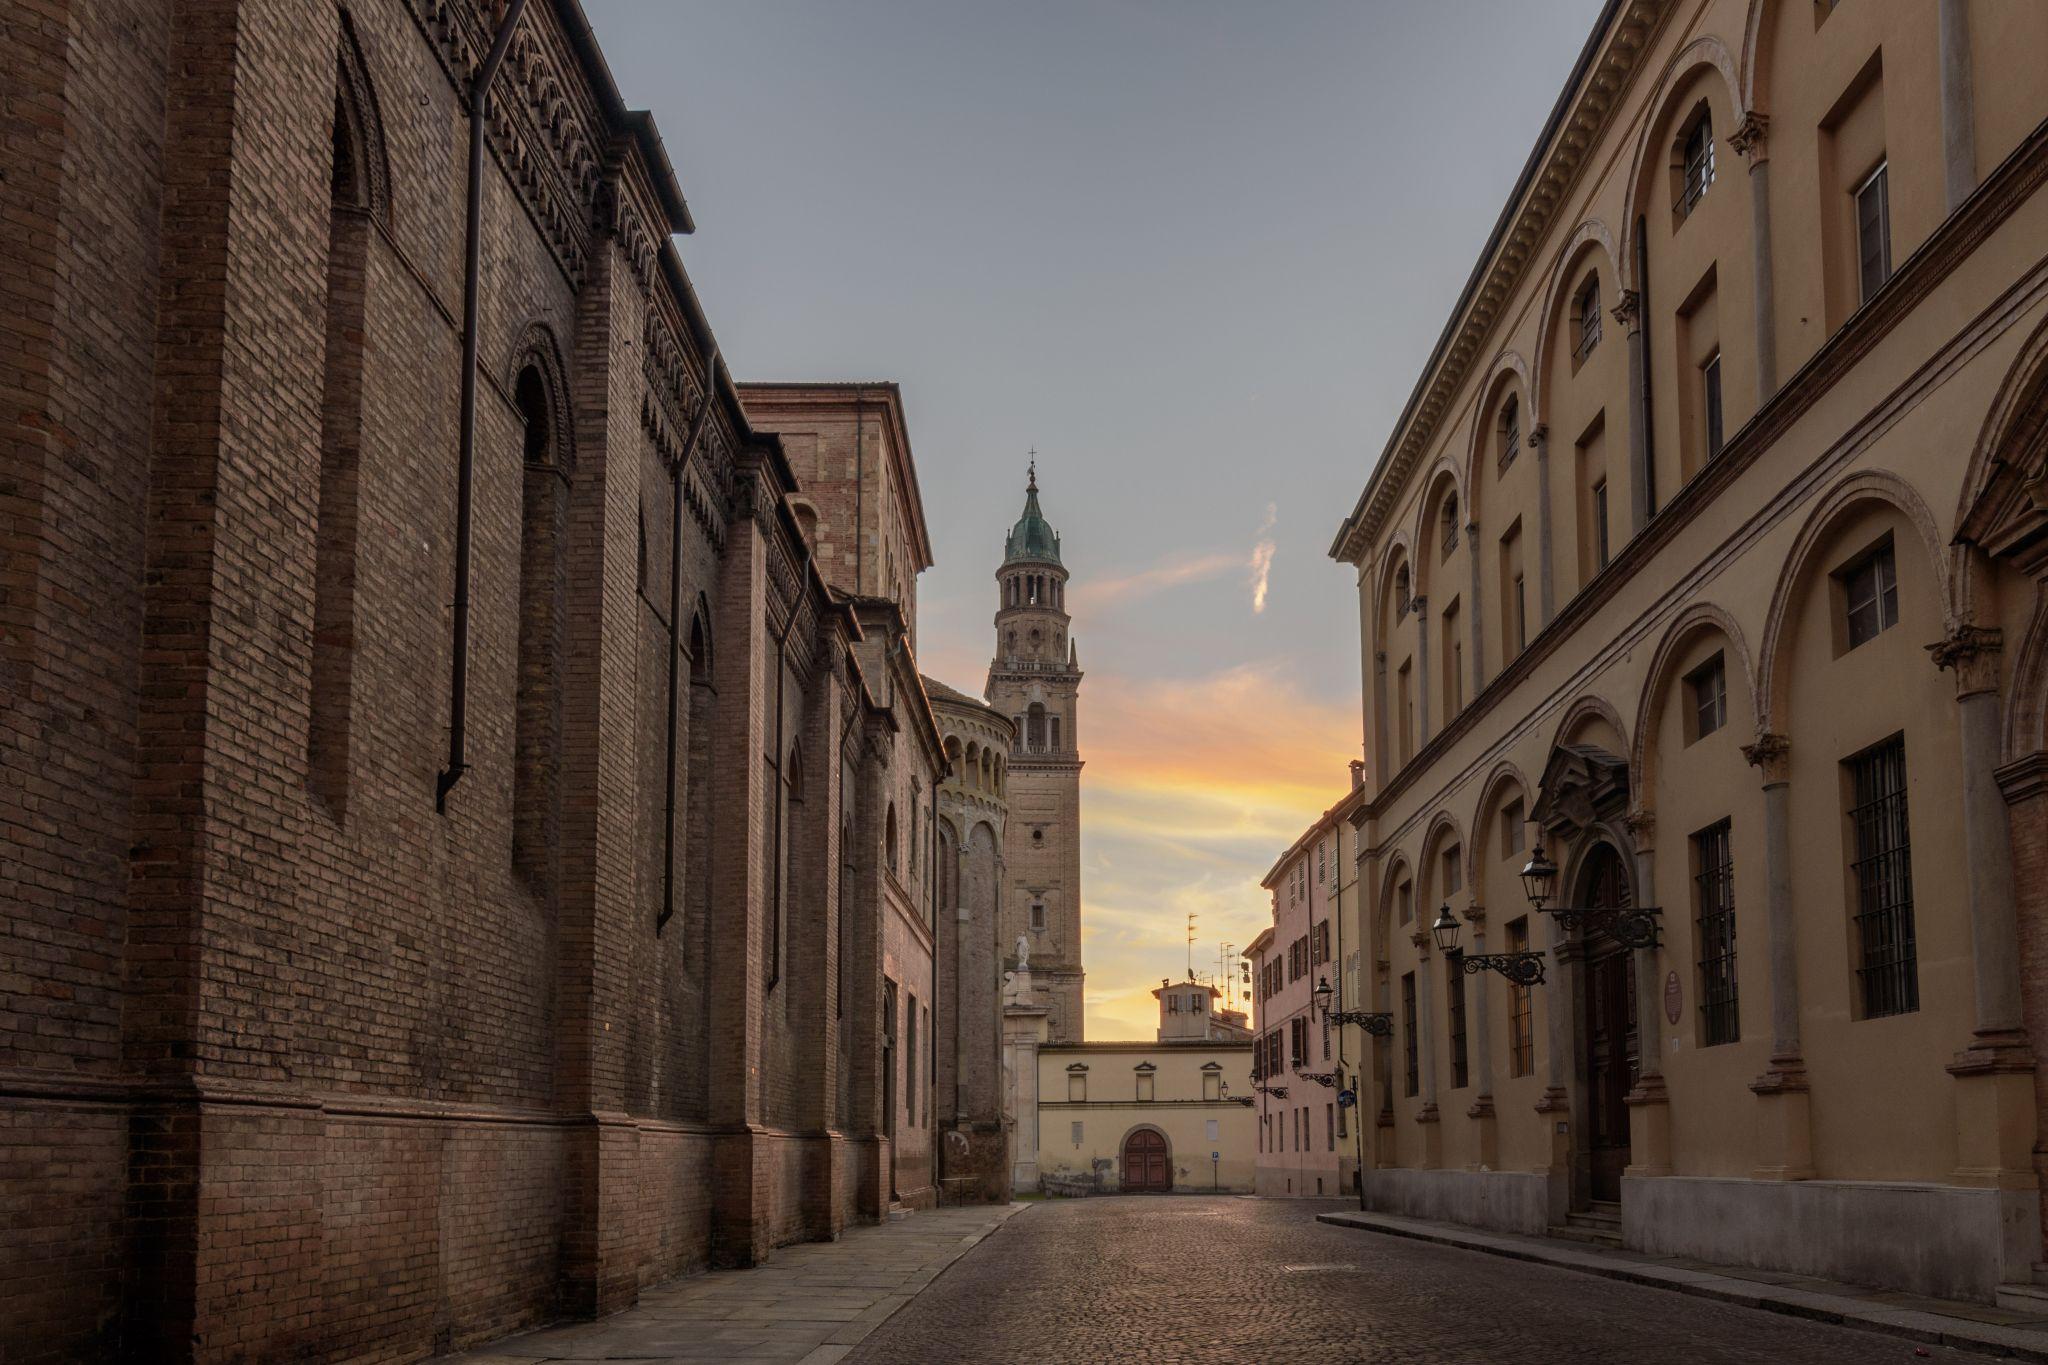 Parma, San Giovanni, Italy